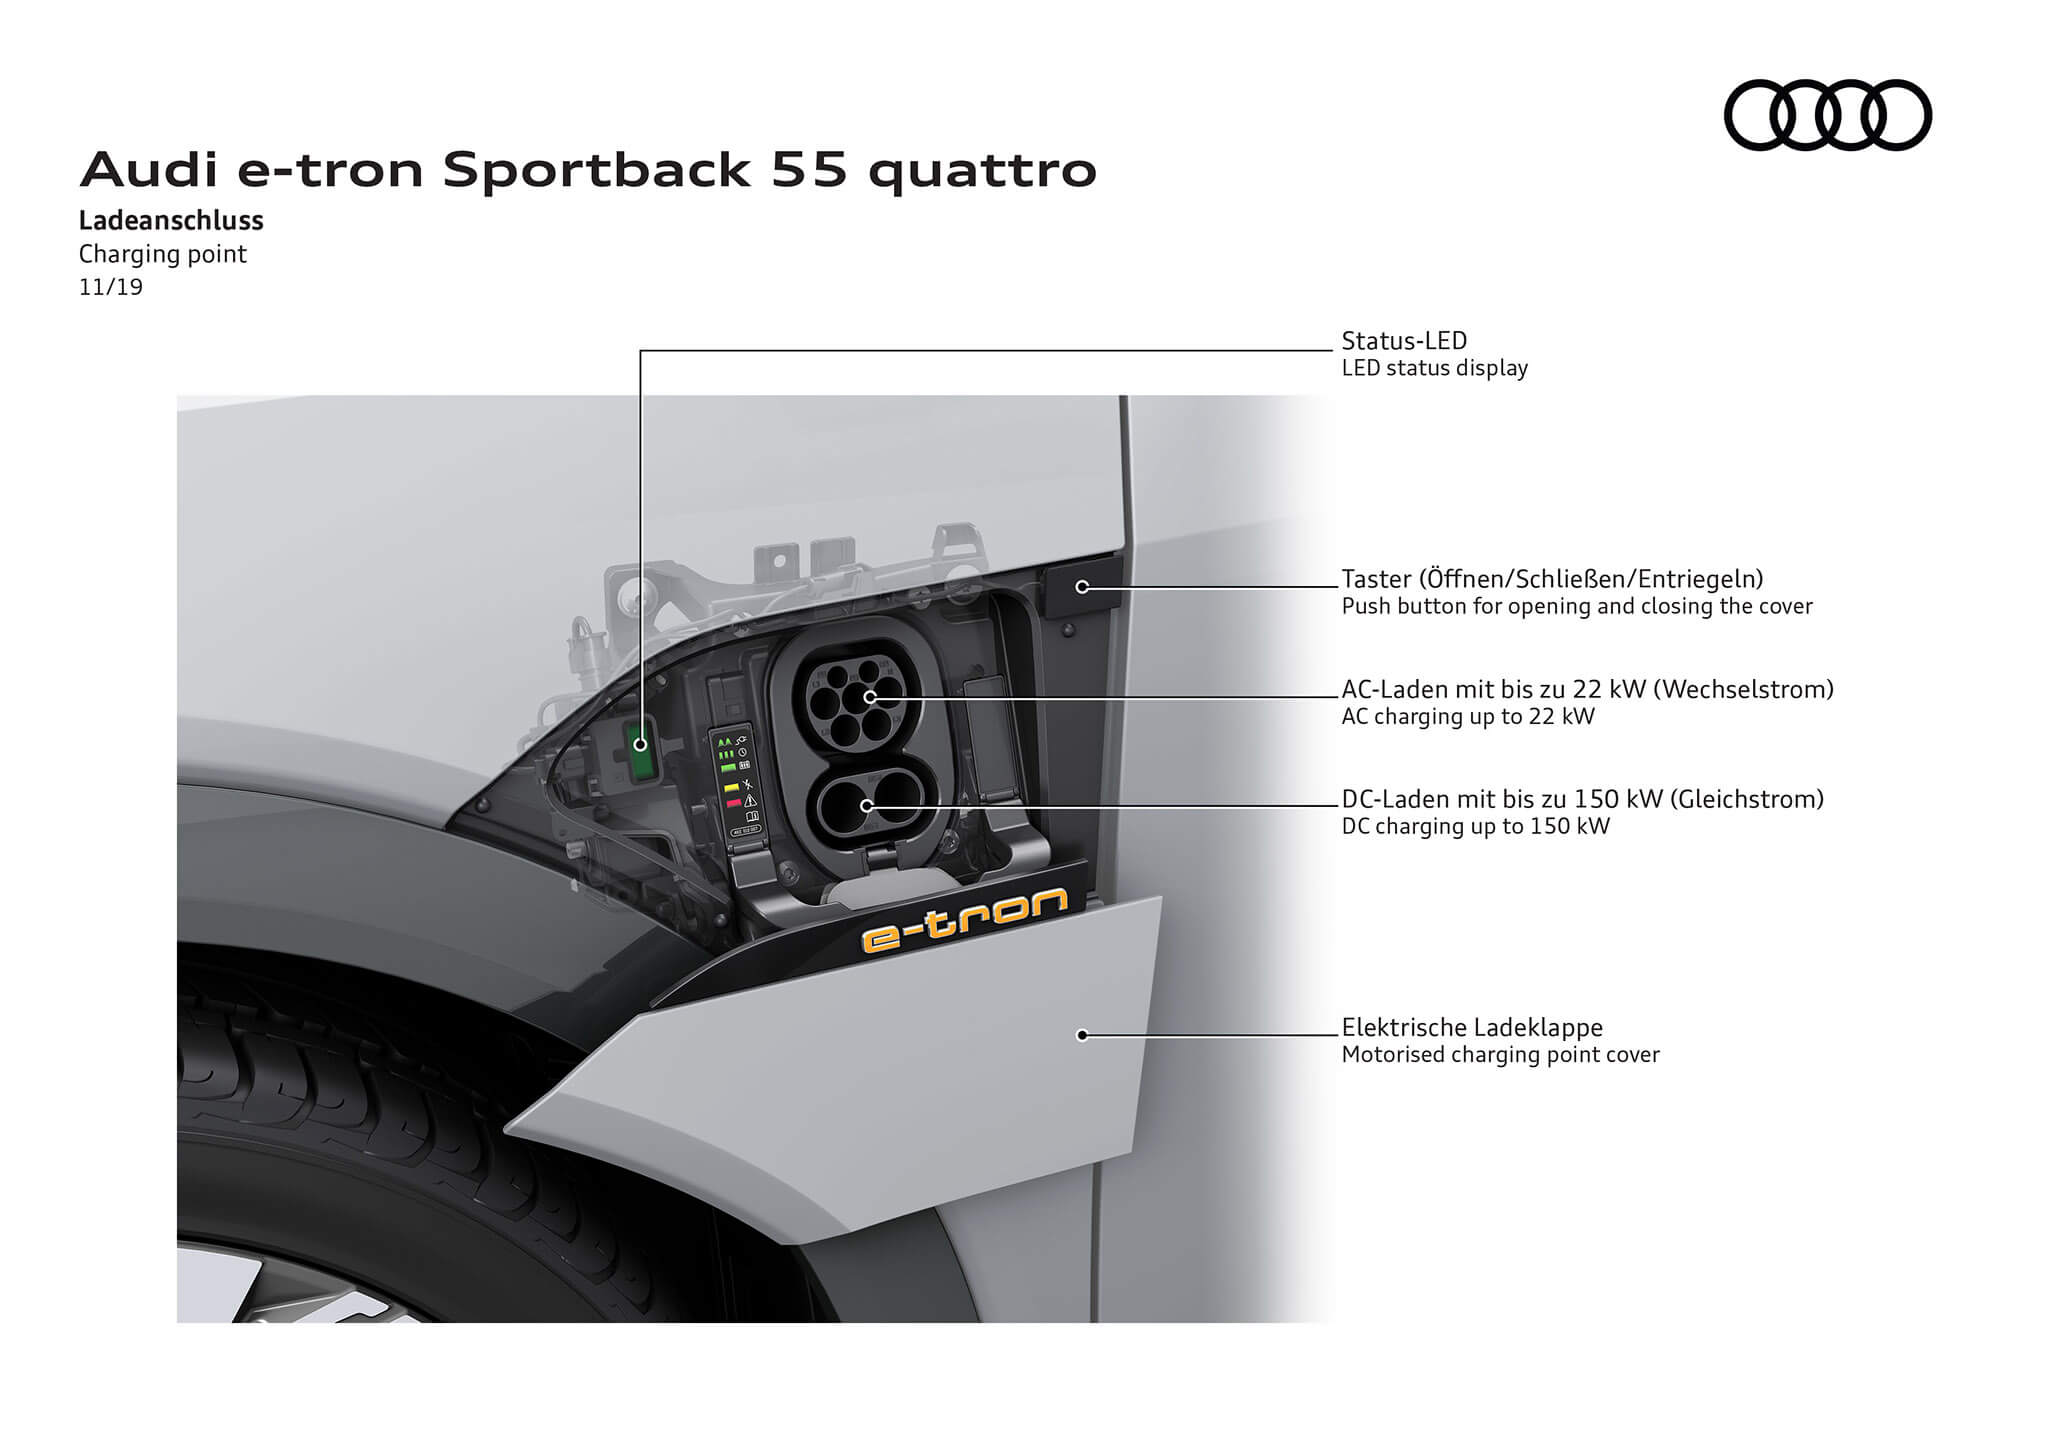 Porta de carregamento, Audi e-tron